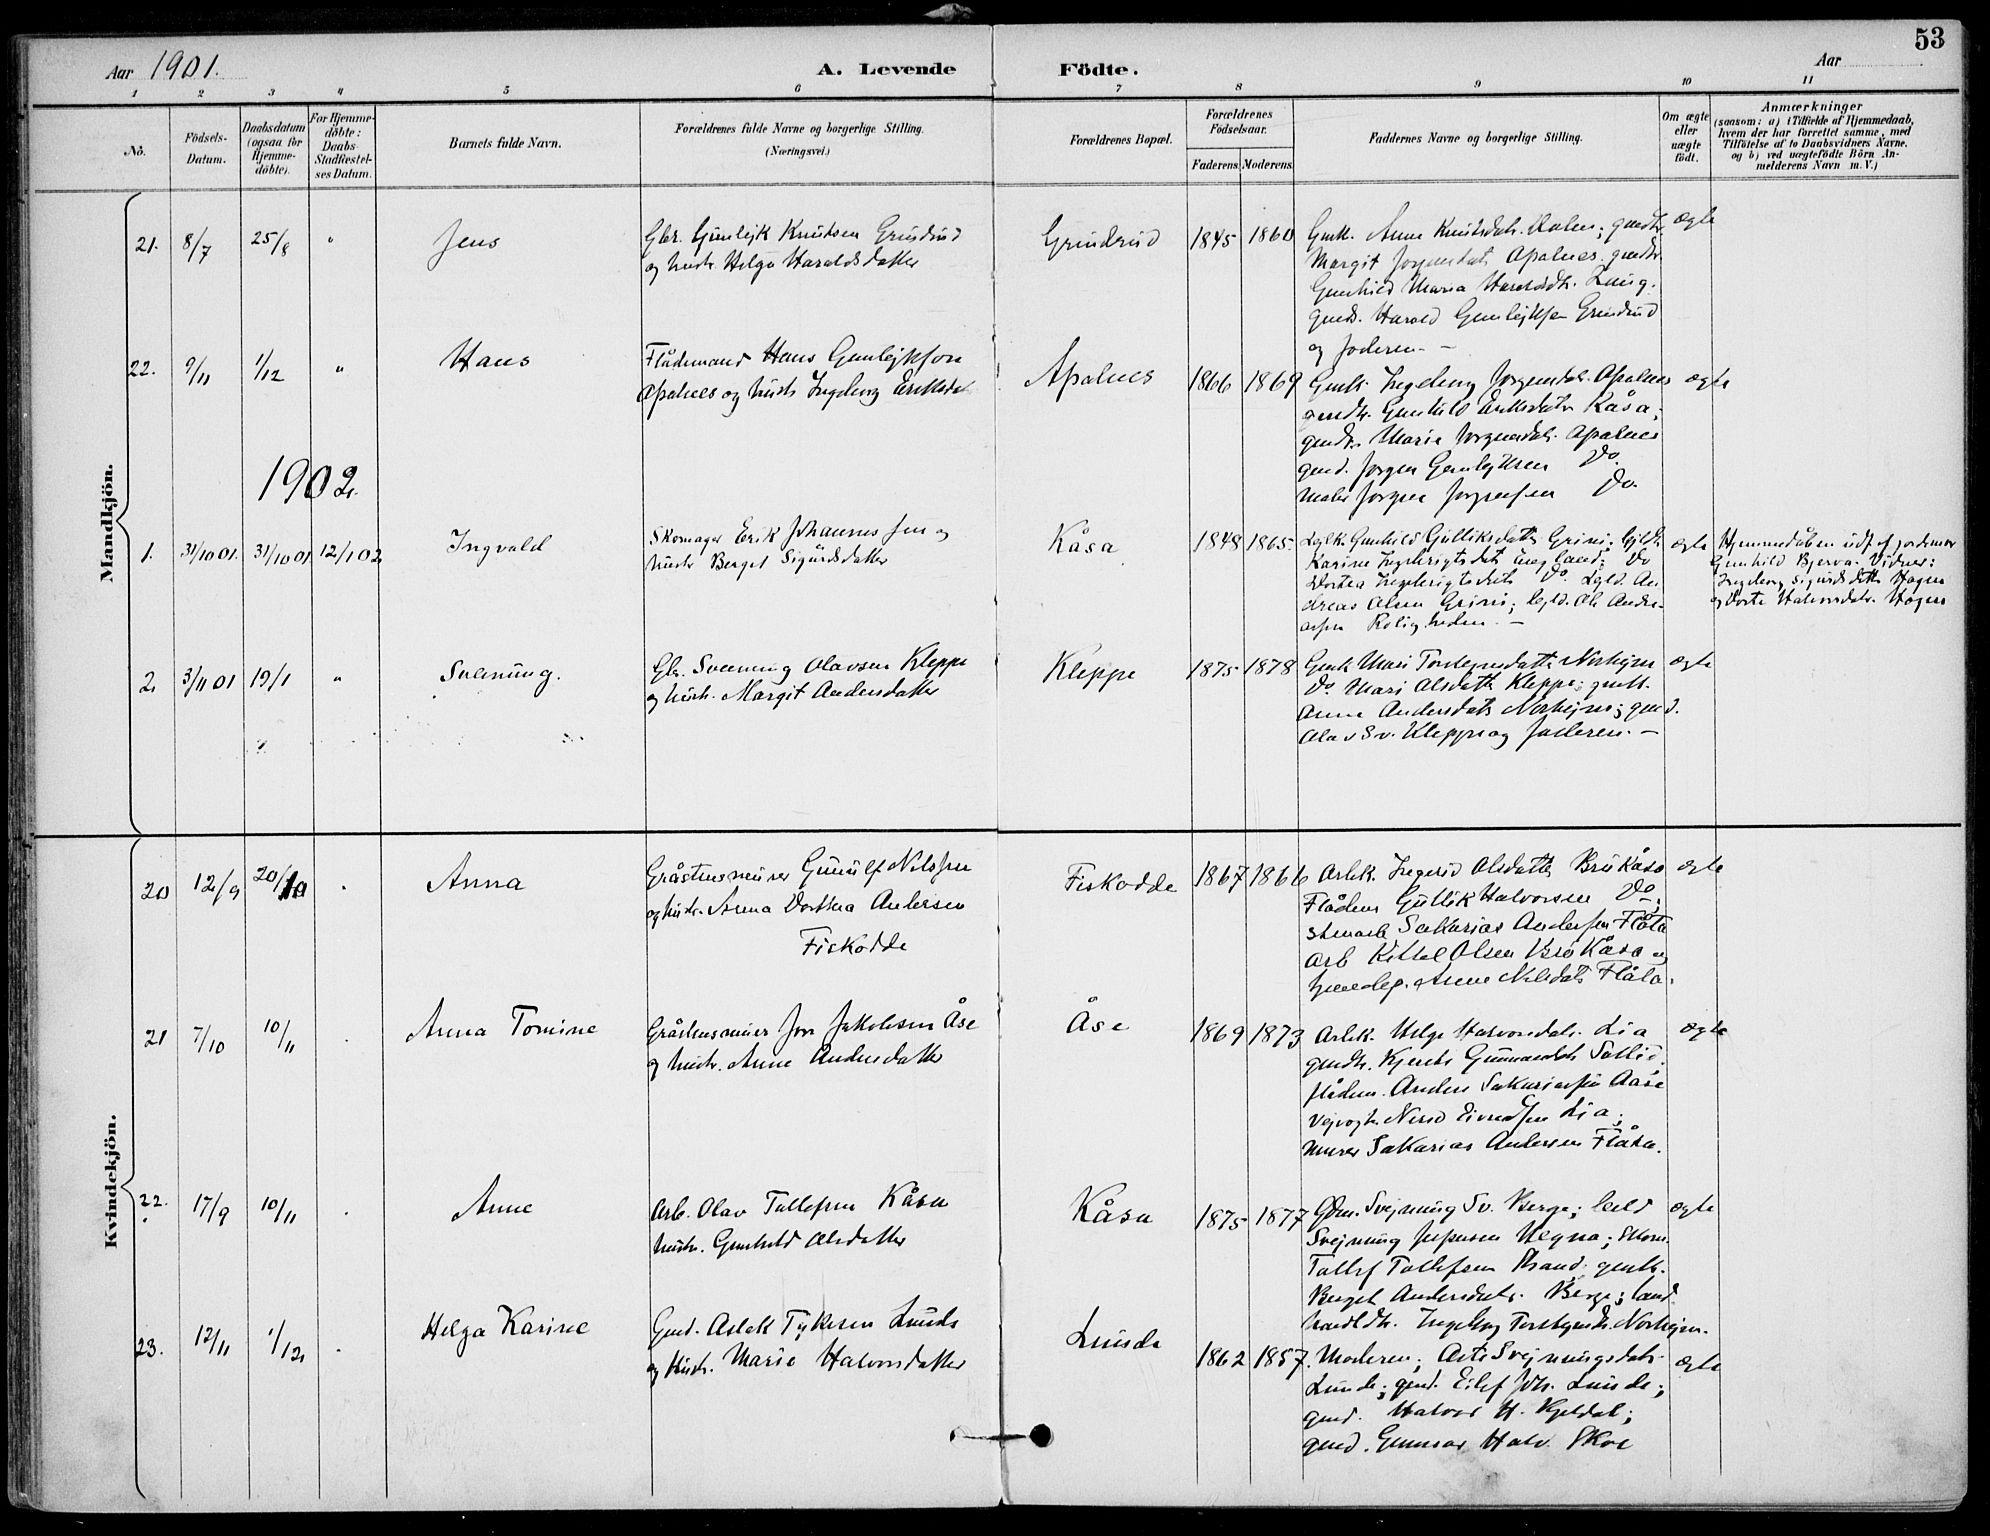 SAKO, Lunde kirkebøker, F/Fa/L0003: Ministerialbok nr. I 3, 1893-1902, s. 53